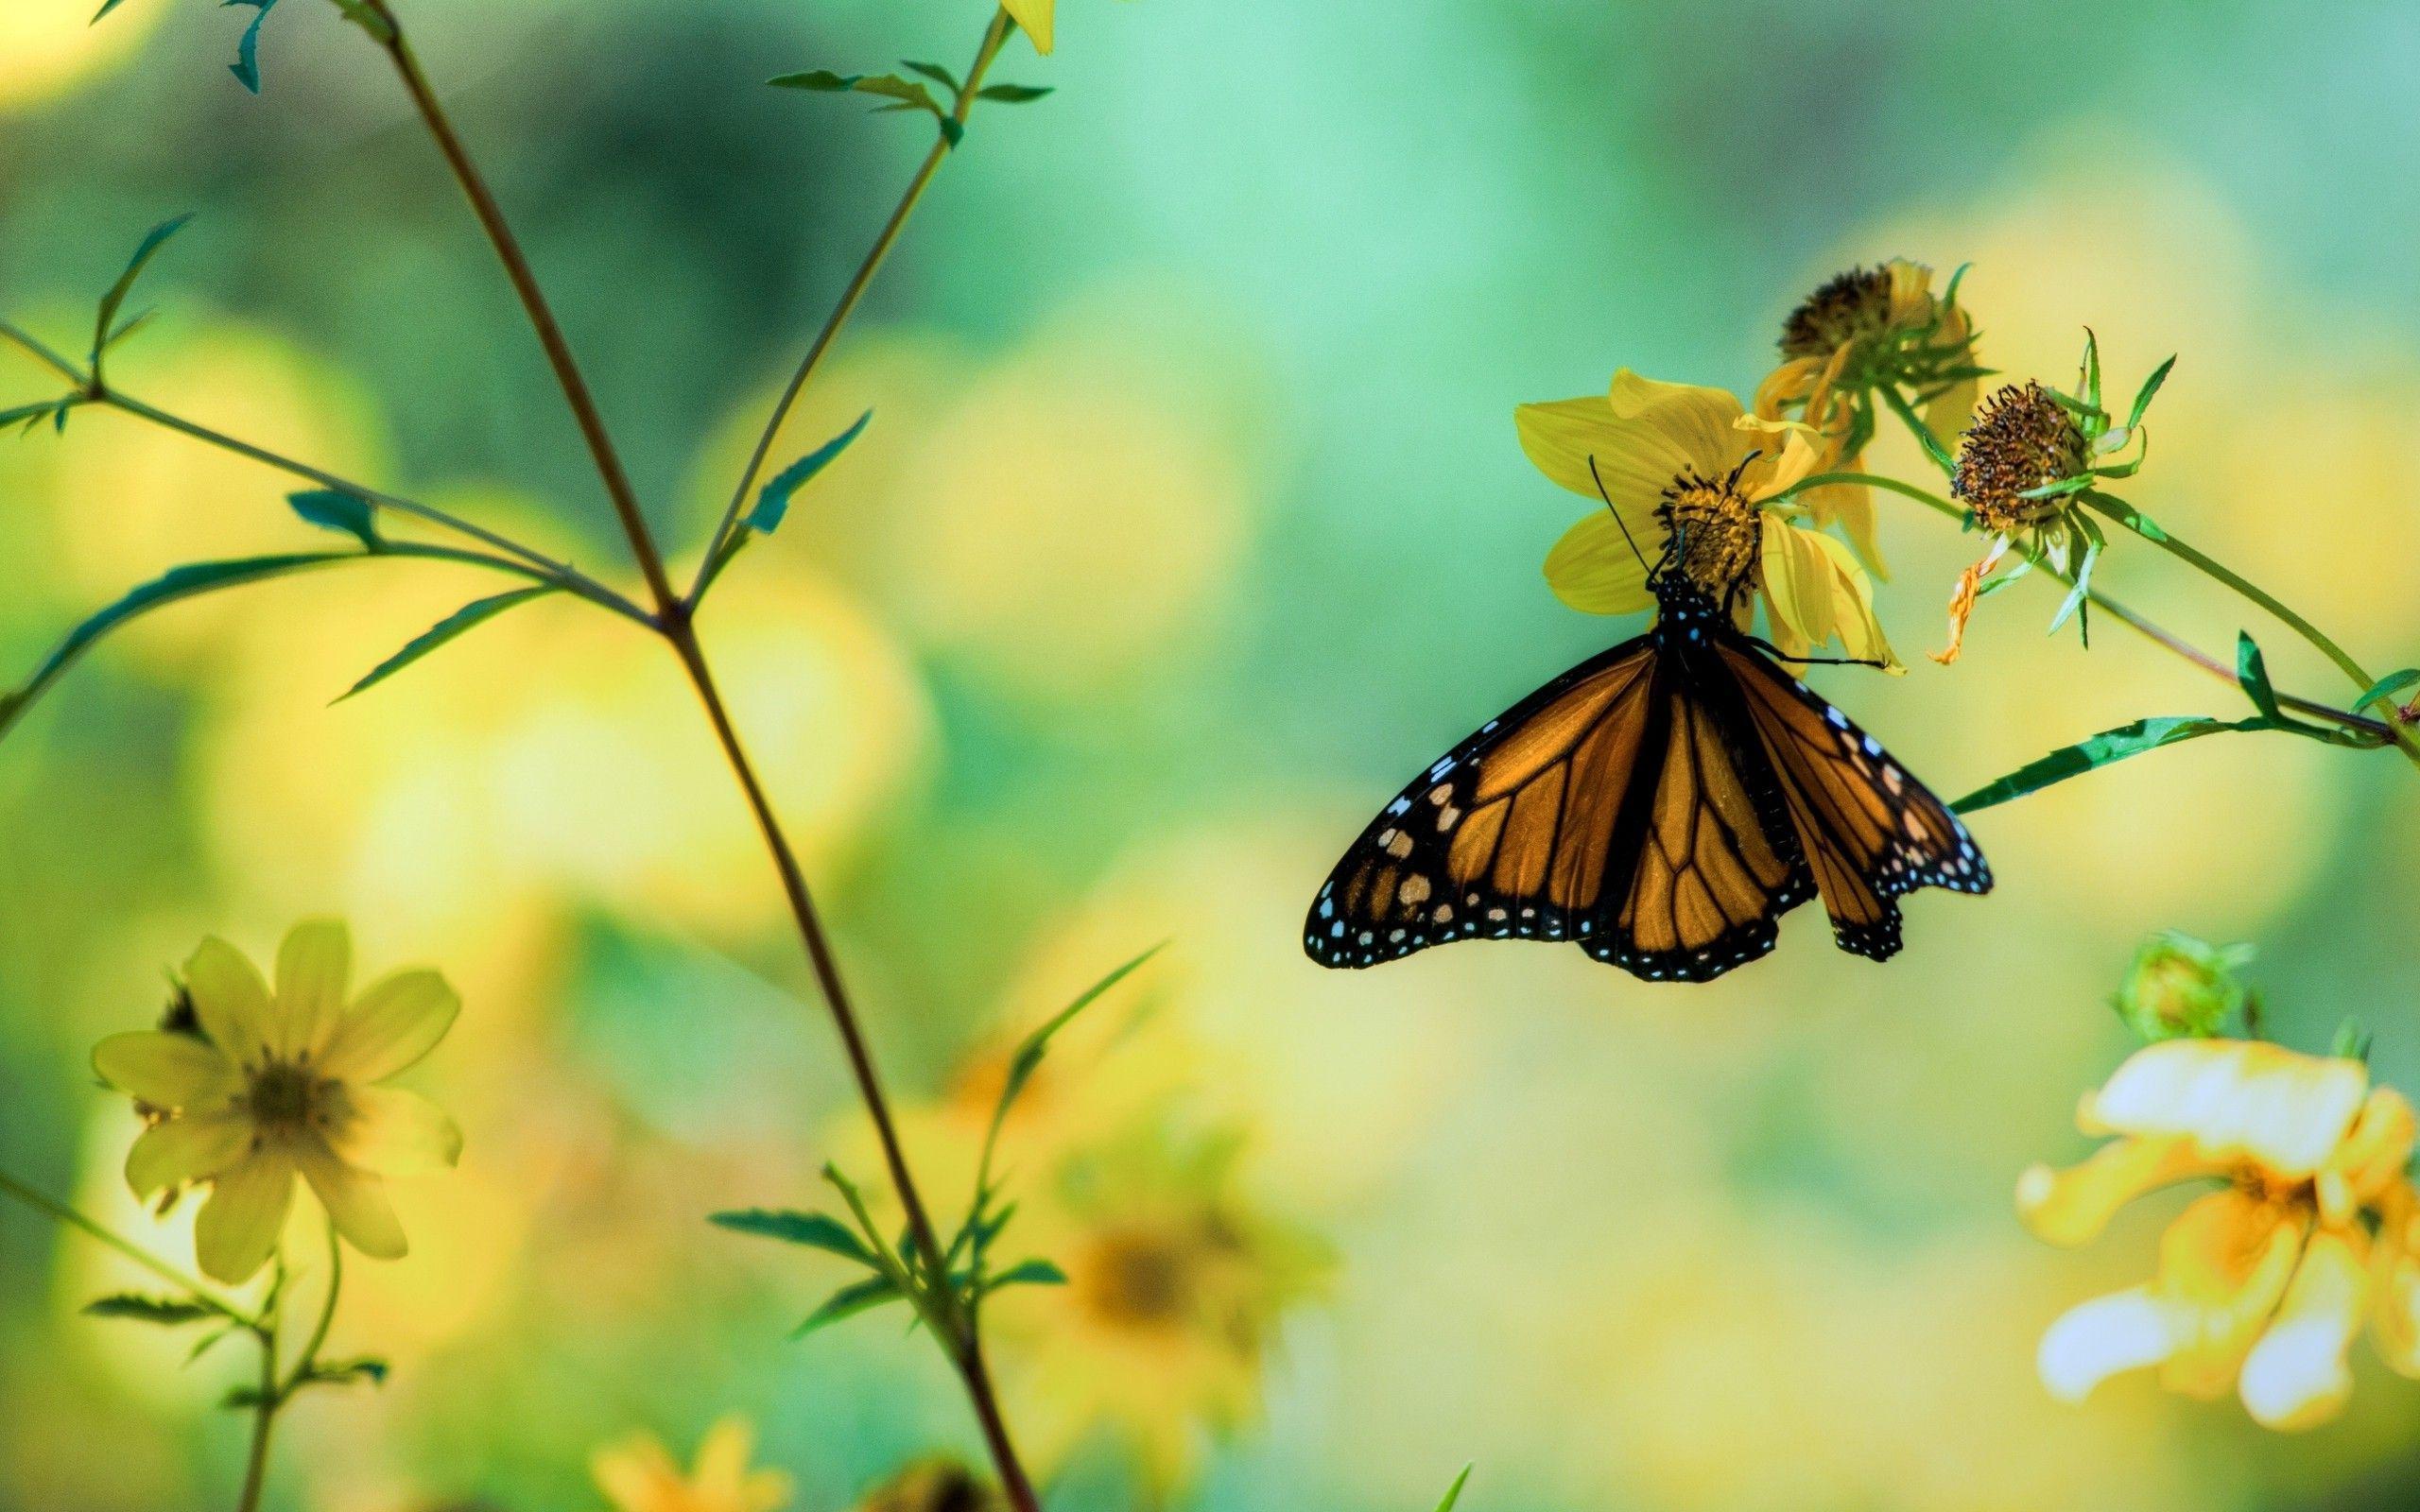 hd rainbow butterfly wallpaper - photo #47